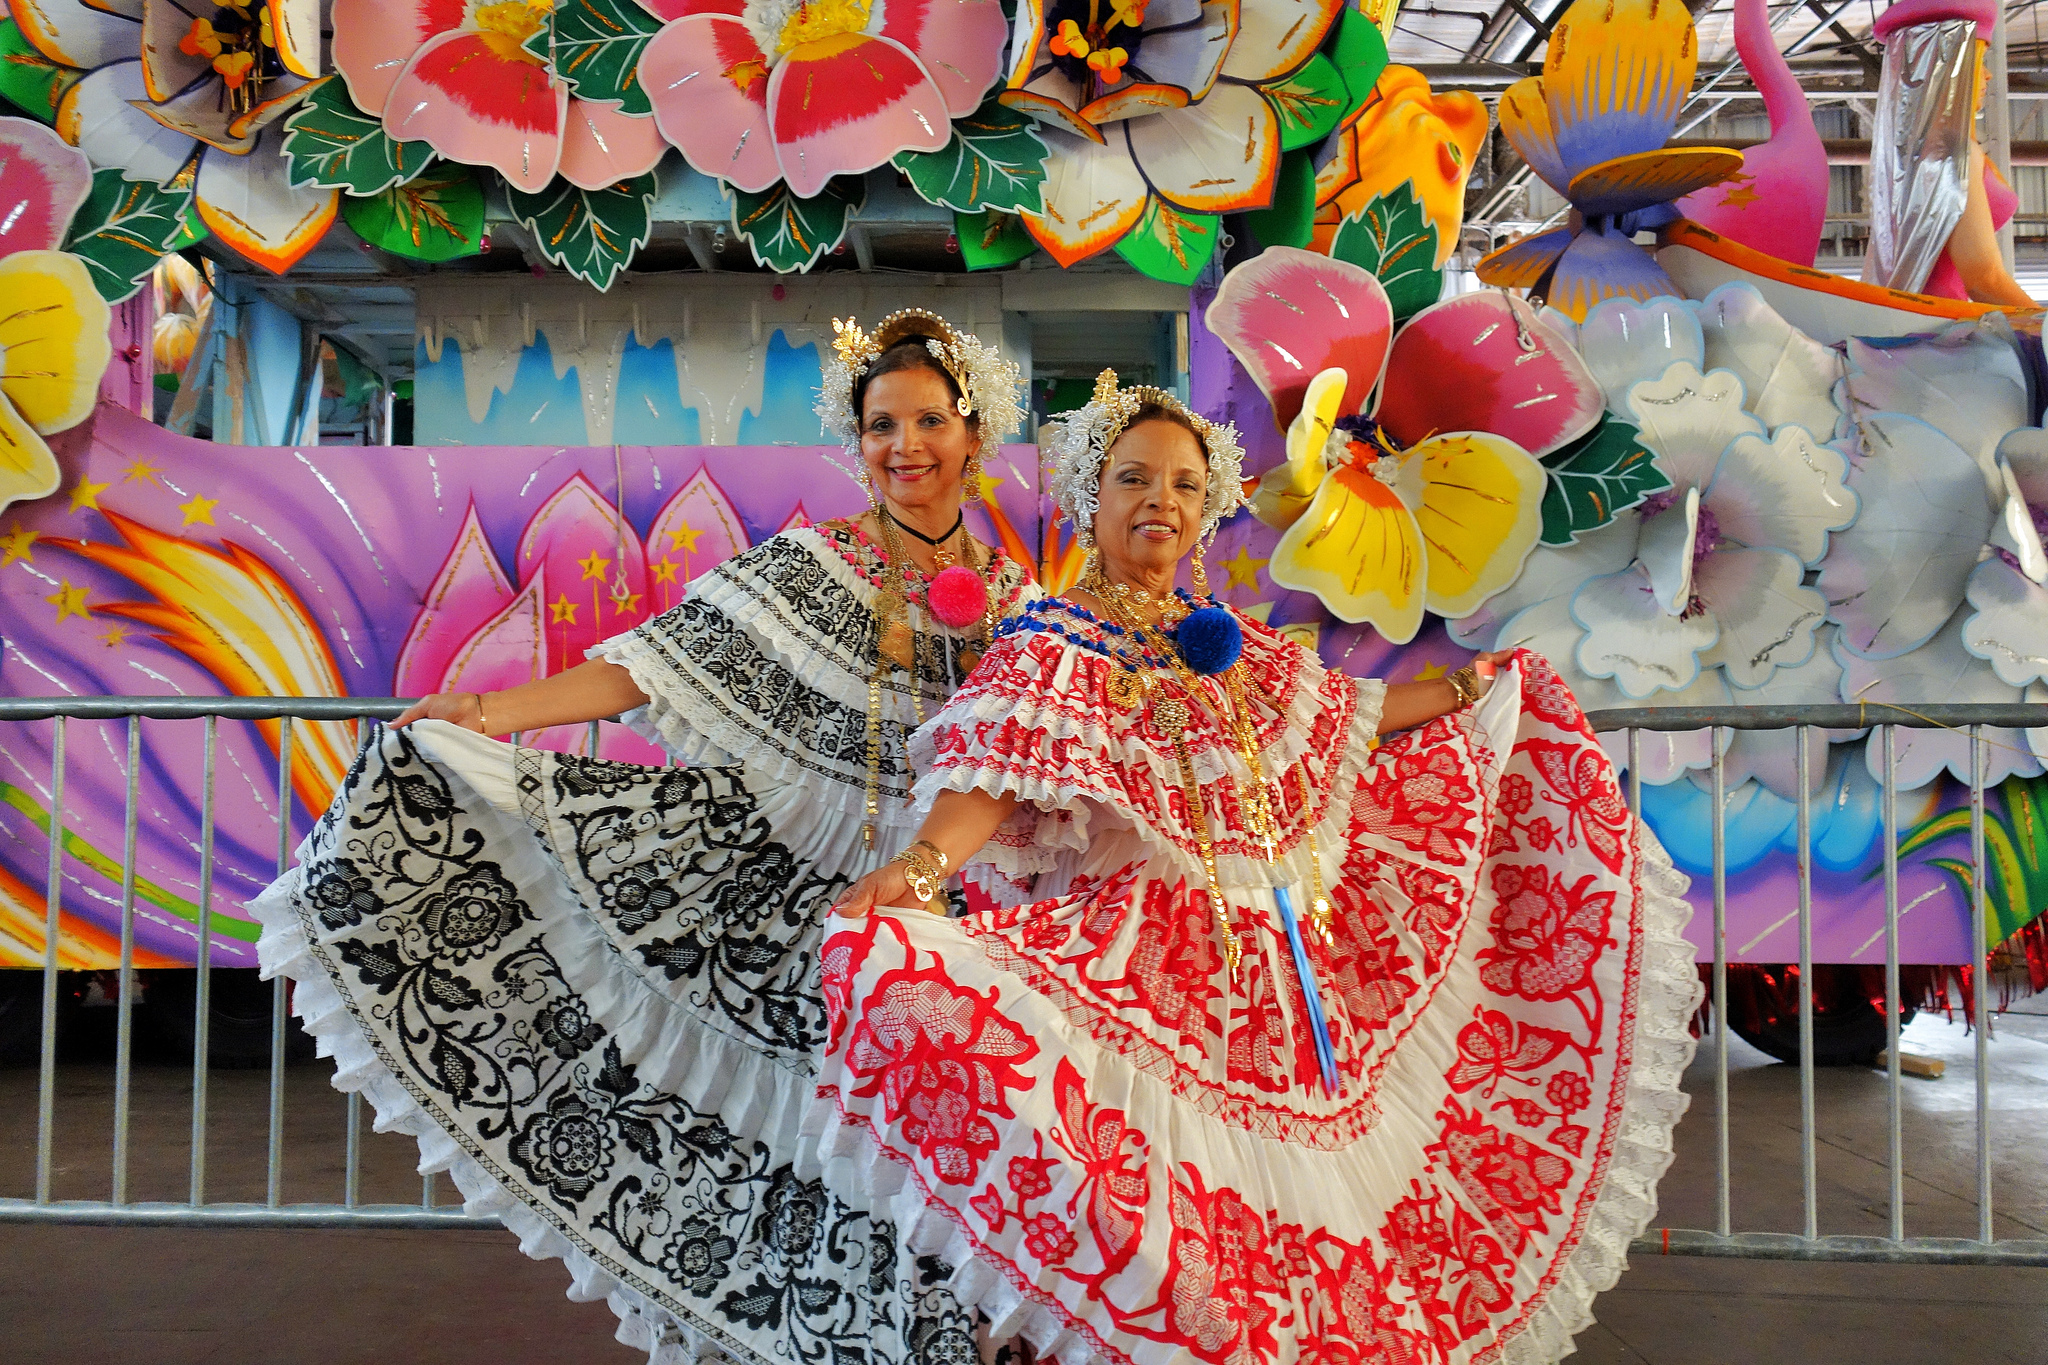 Carnaval Latino 2016 Celebrates Hispanic Heritage